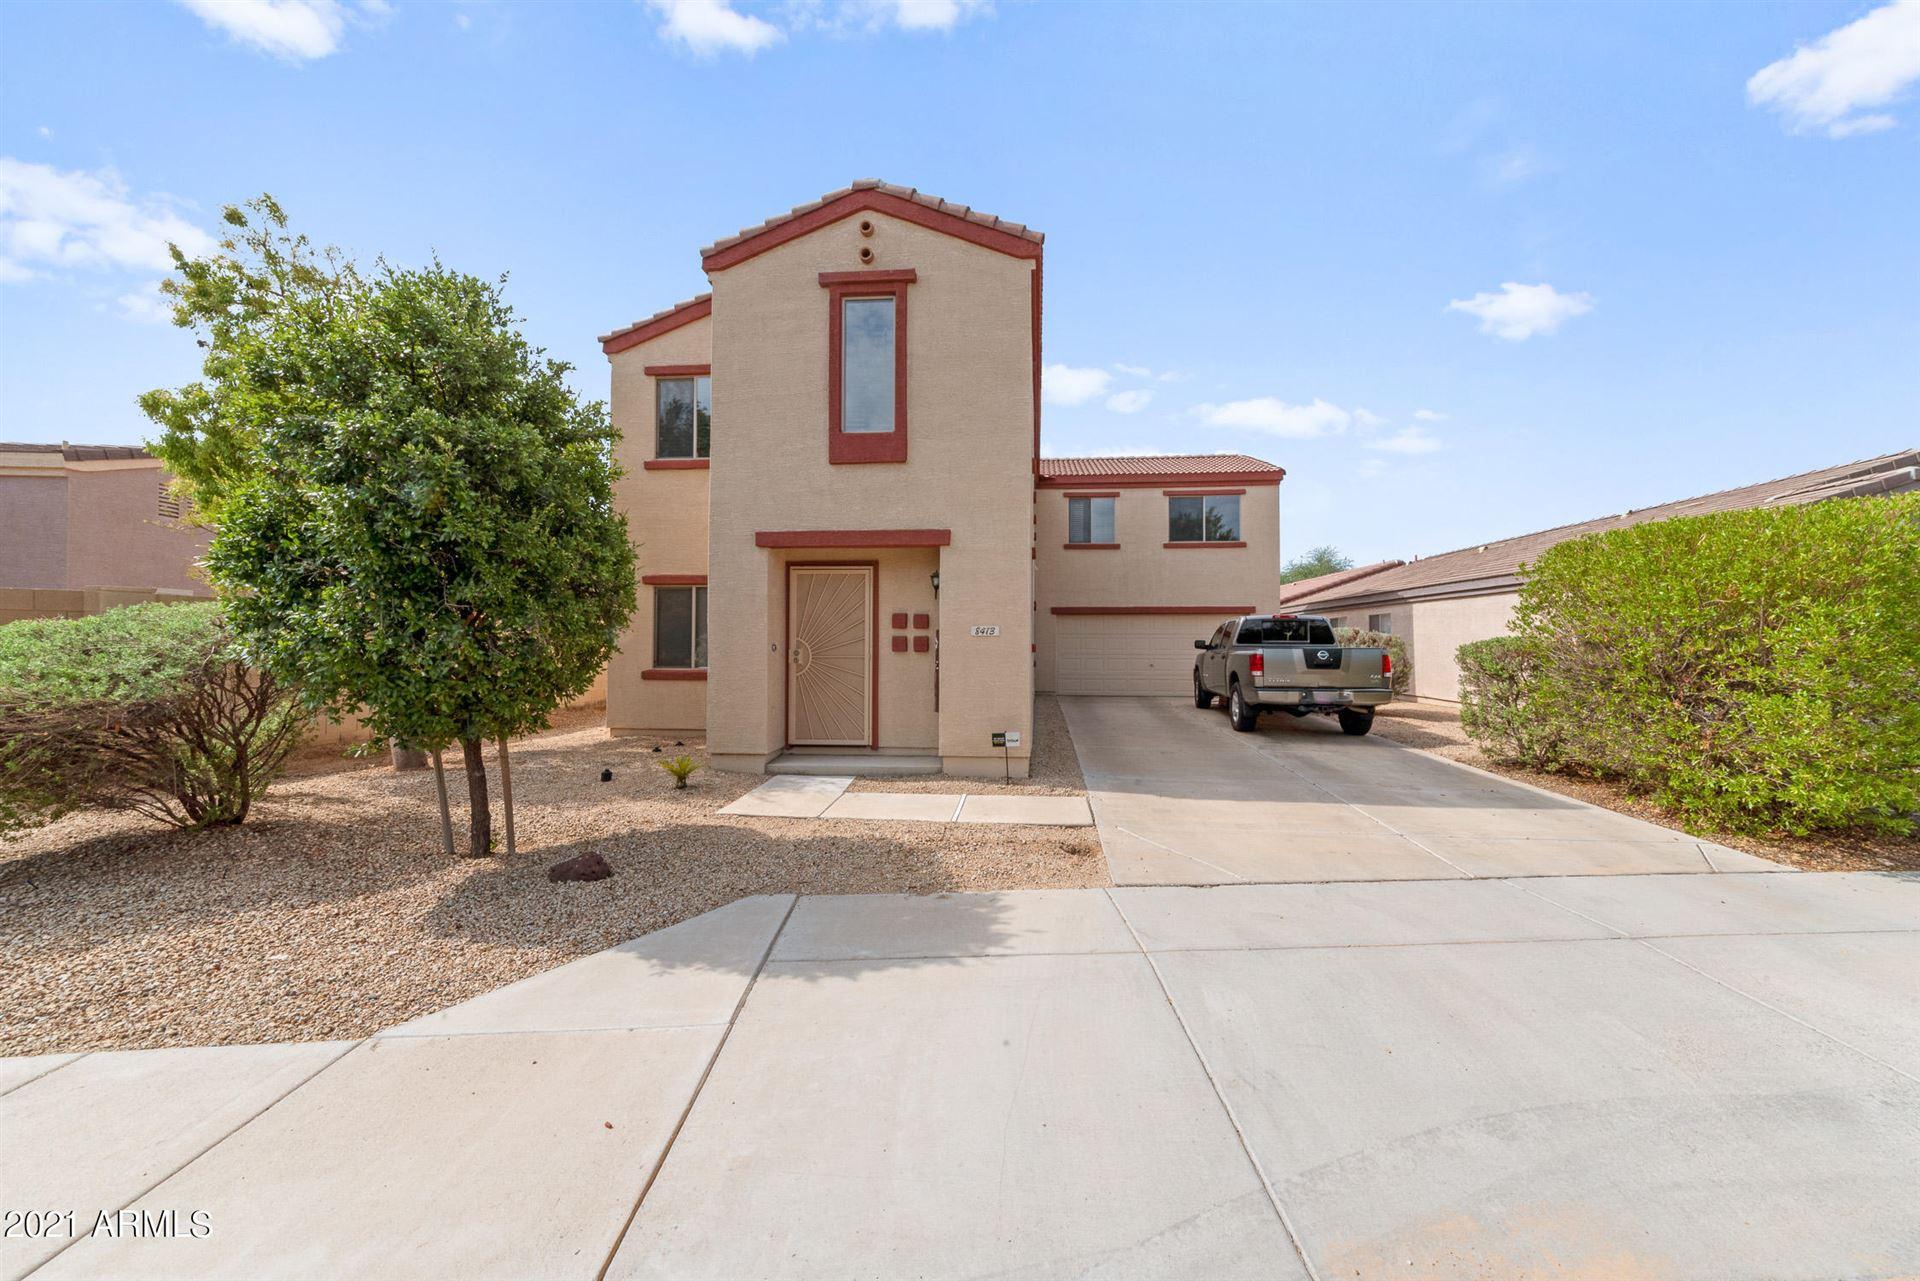 Photo of 8413 W FLAVIA Haven, Tolleson, AZ 85353 (MLS # 6265703)